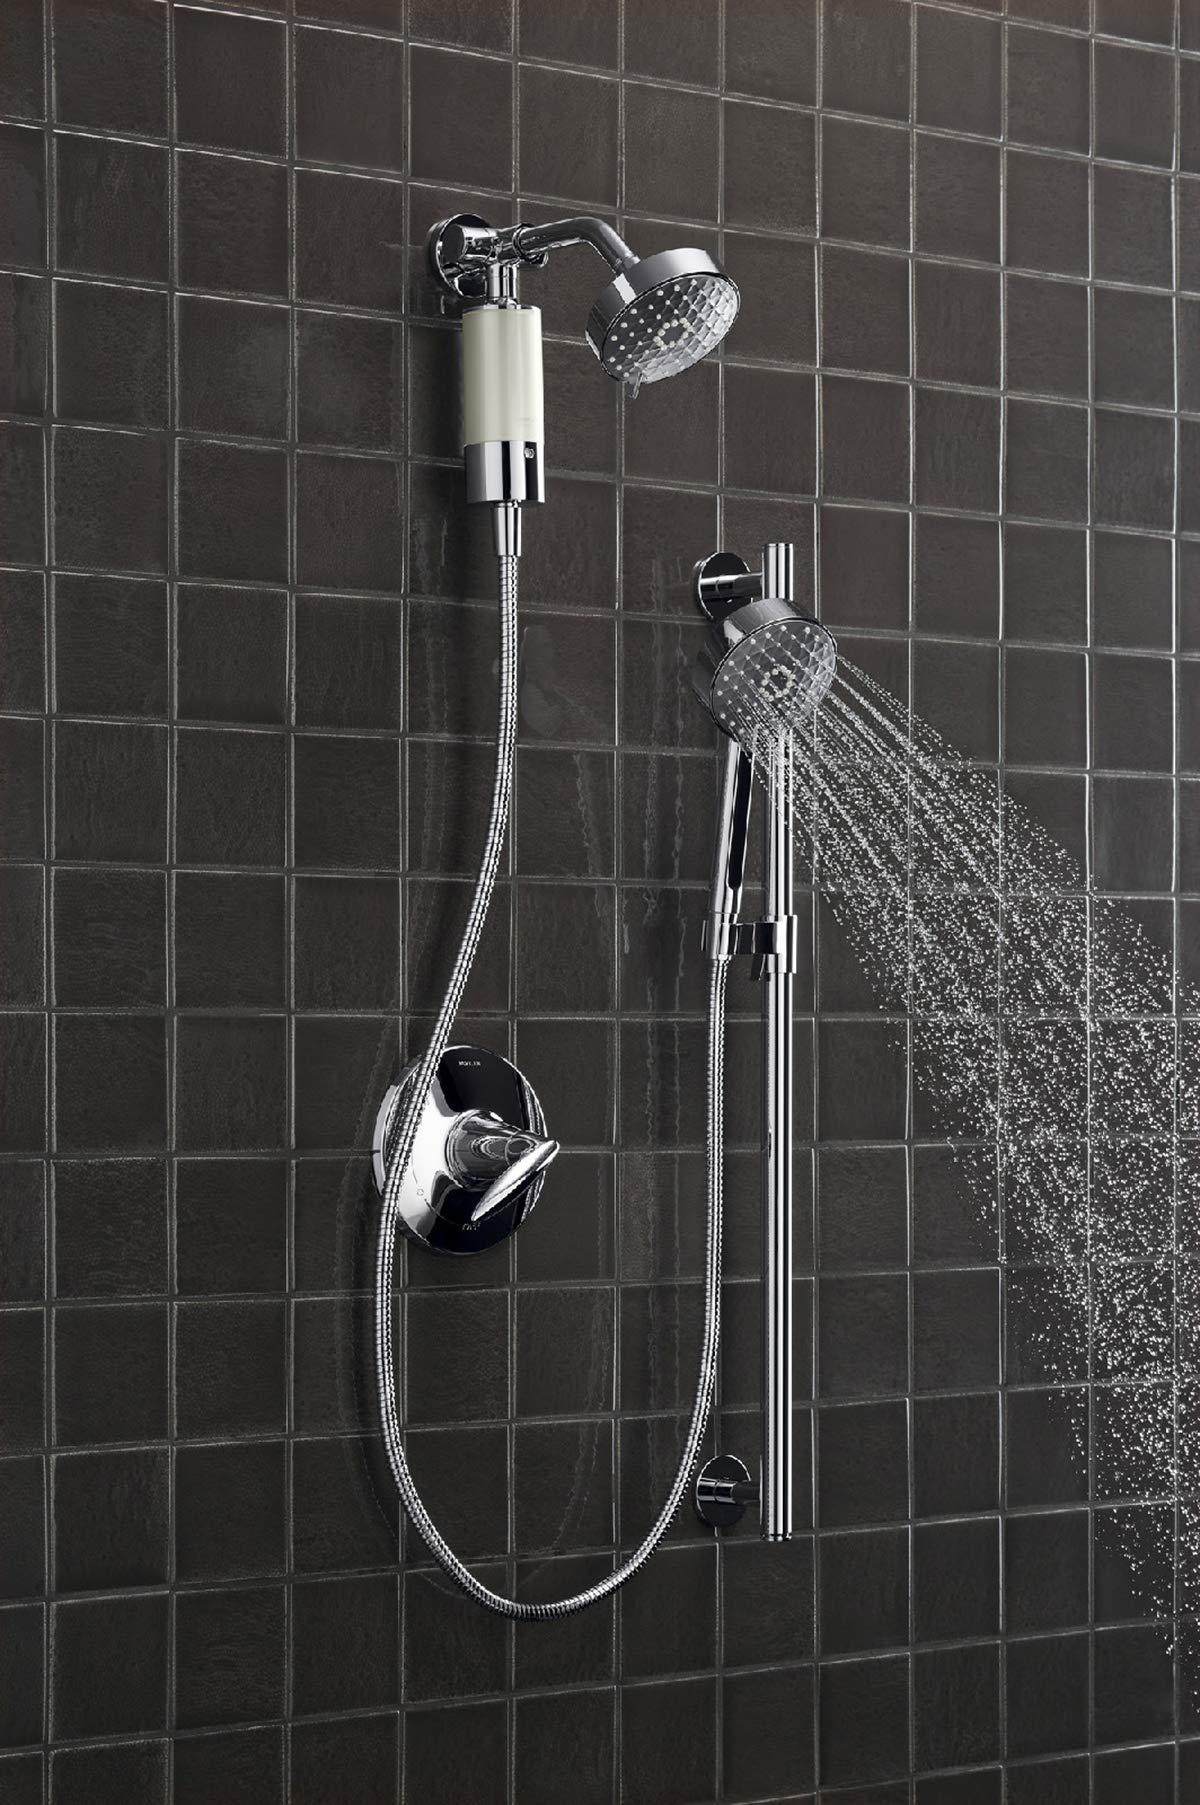 Kohler 30646-CP Aquifer Shower Water Filtration System, Reduce Chlorine and Odor, Includes Filter Replacement by Kohler (Image #9)